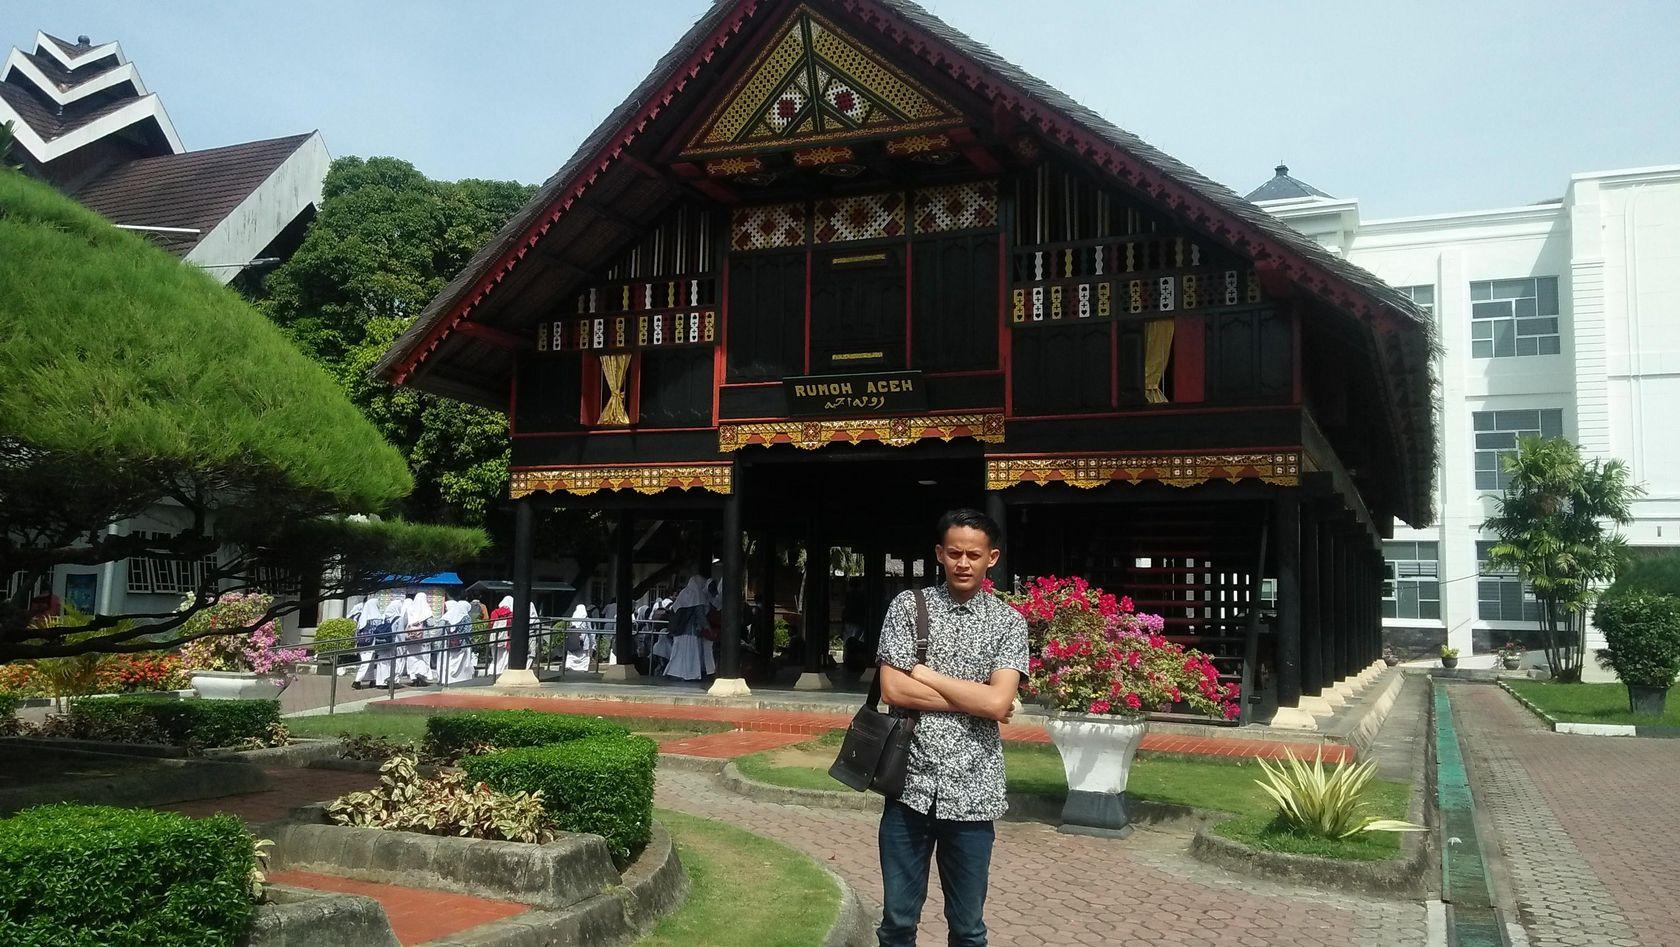 Busy Sebelum Dijadikan Museum Dulunya Rumah Tempat Tinggka Srikandi Aceh